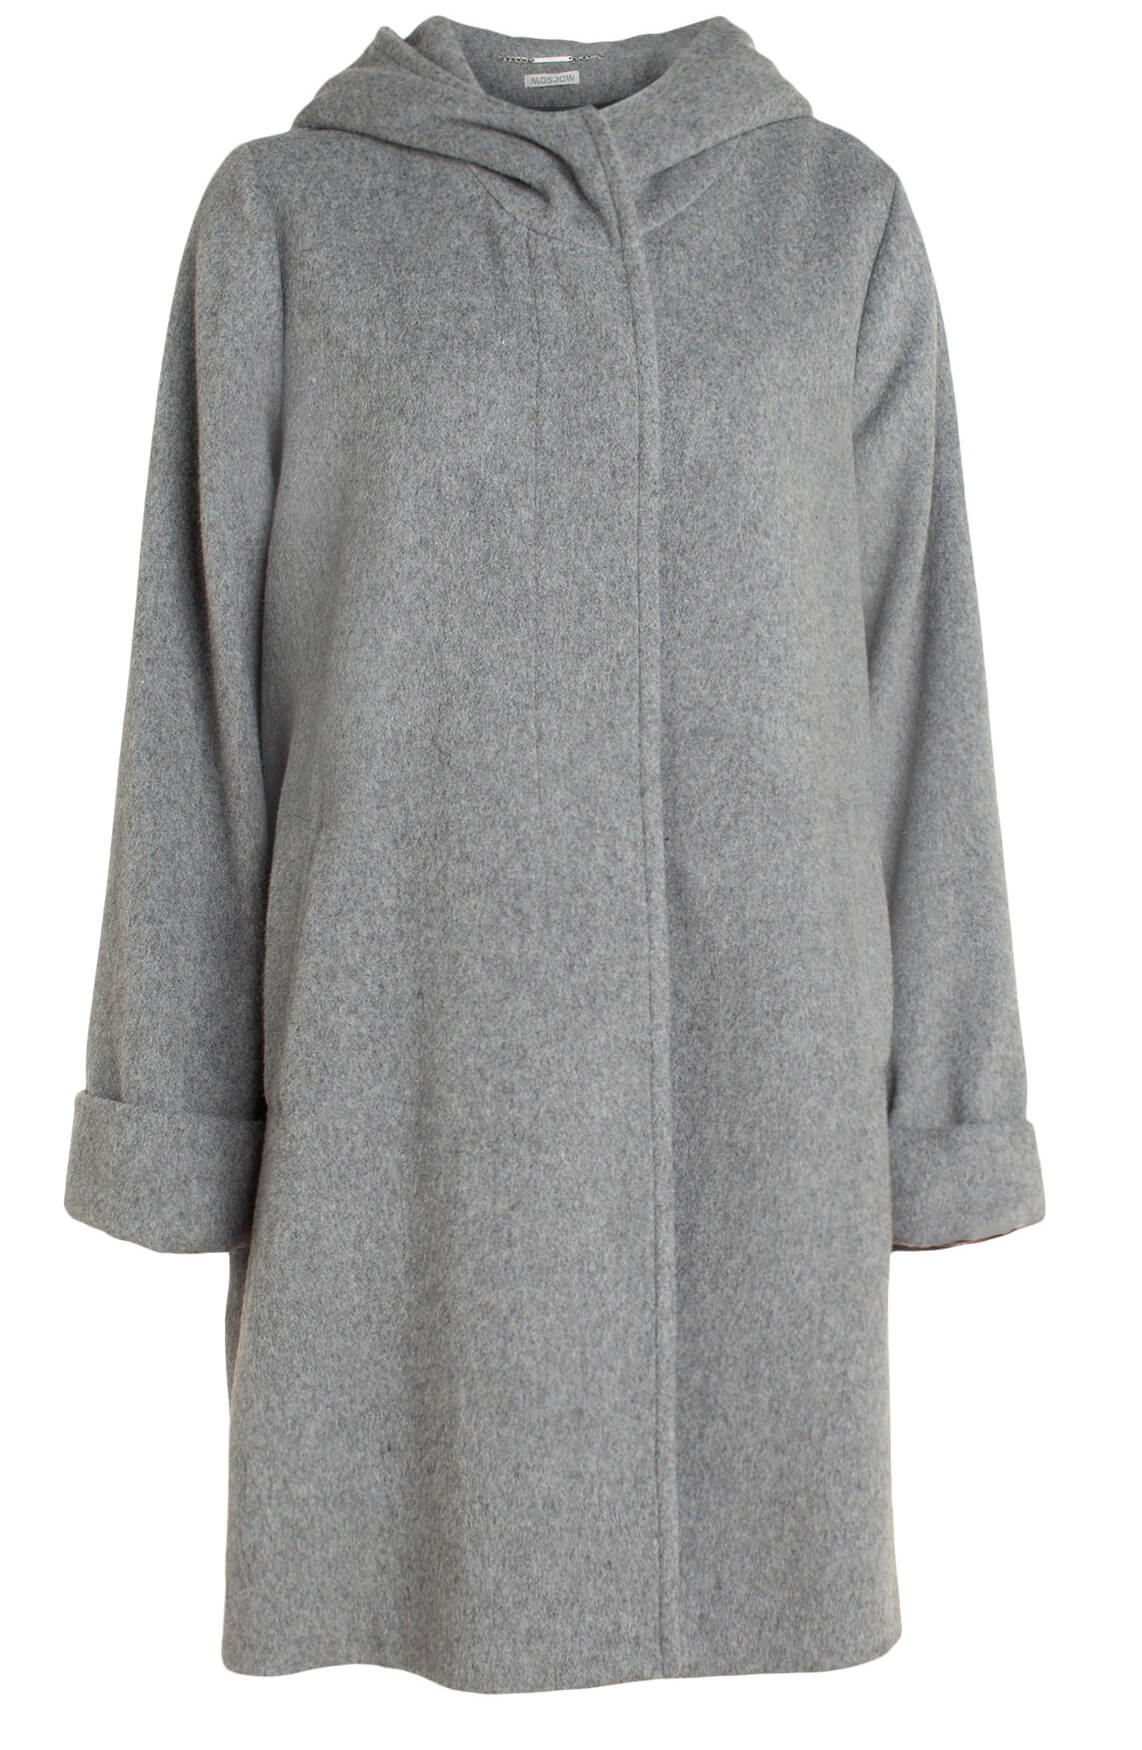 Moscow Dames Asya wool coat Grijs